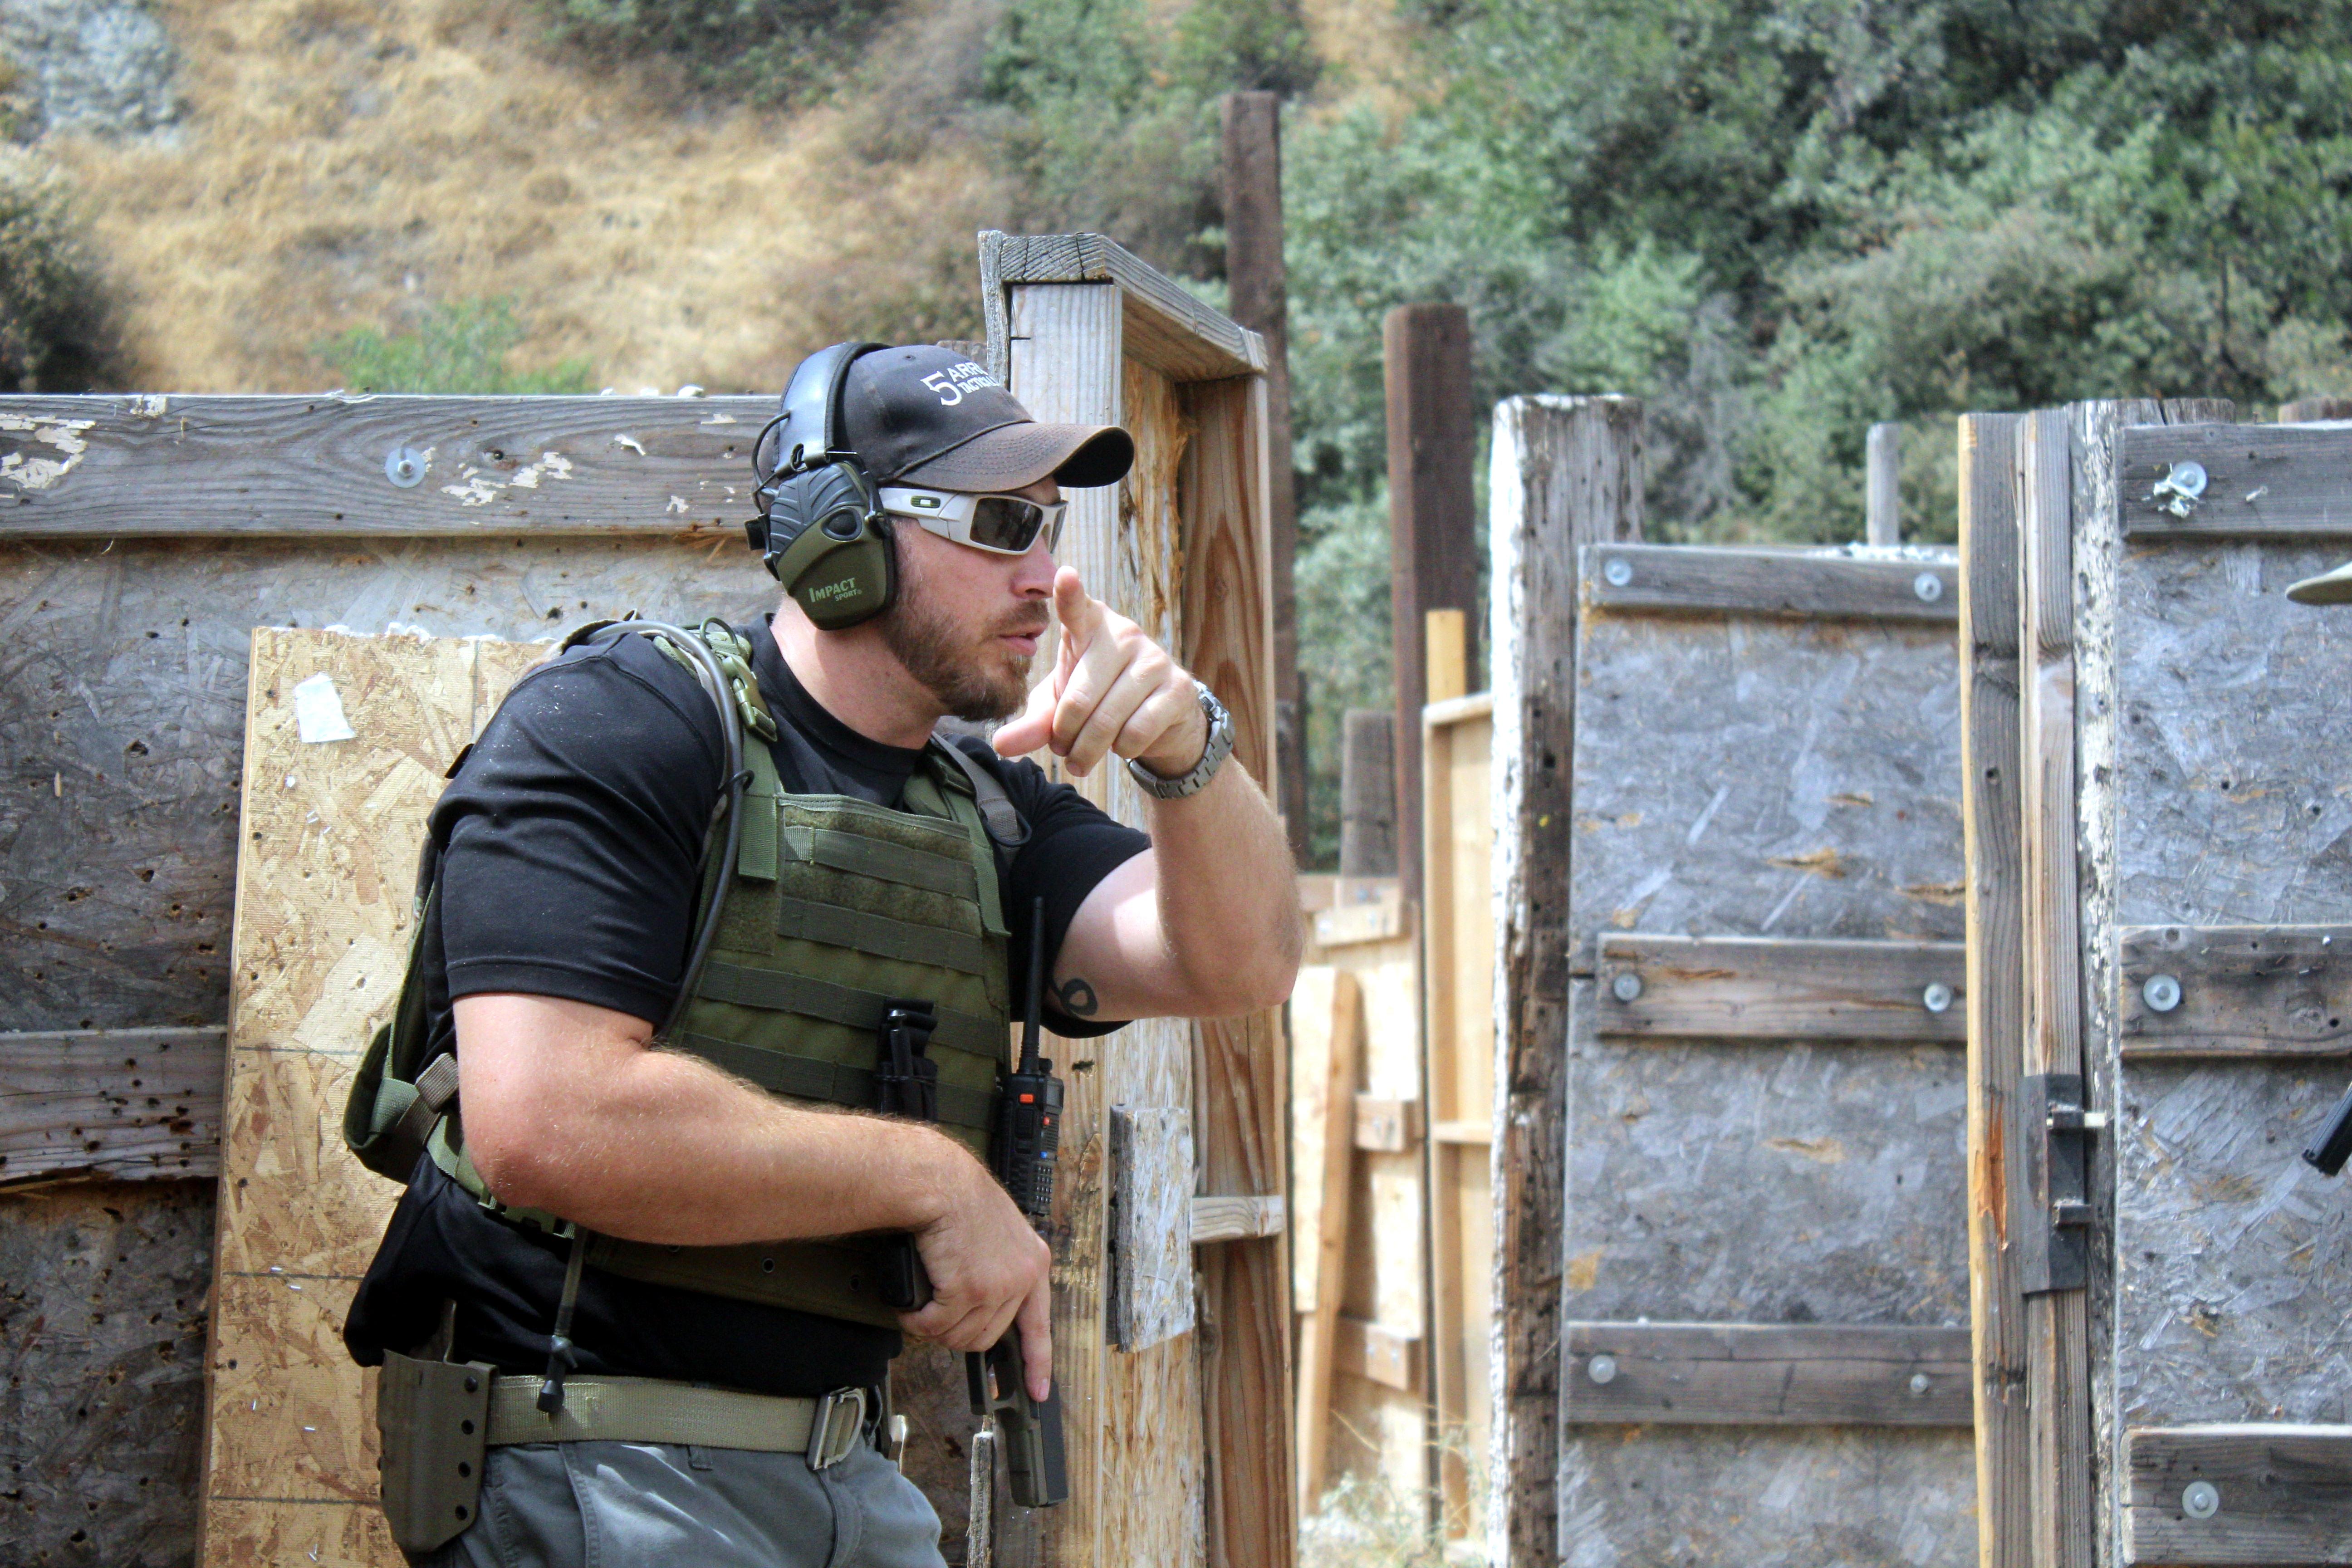 Defensive (Tactical) Pistol - Level 1